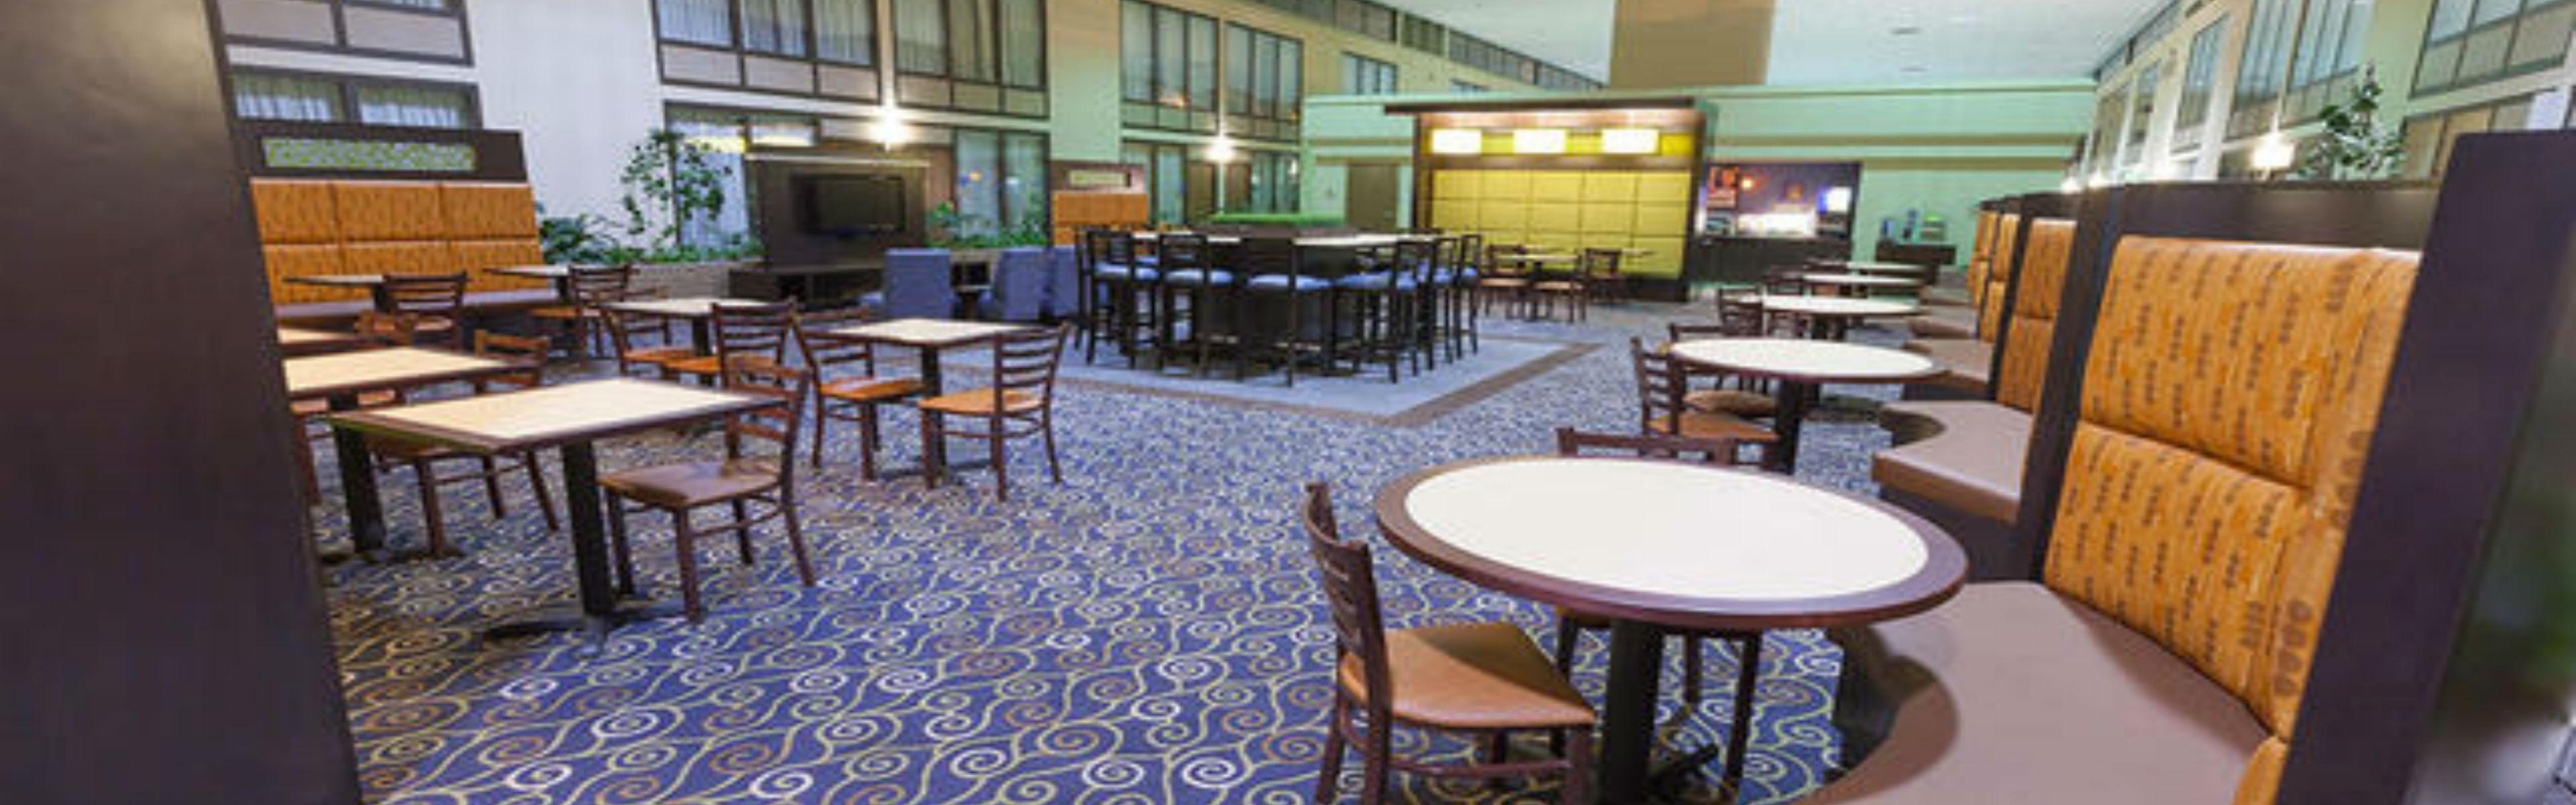 Holiday Inn Express Little Rock-Airport image 3